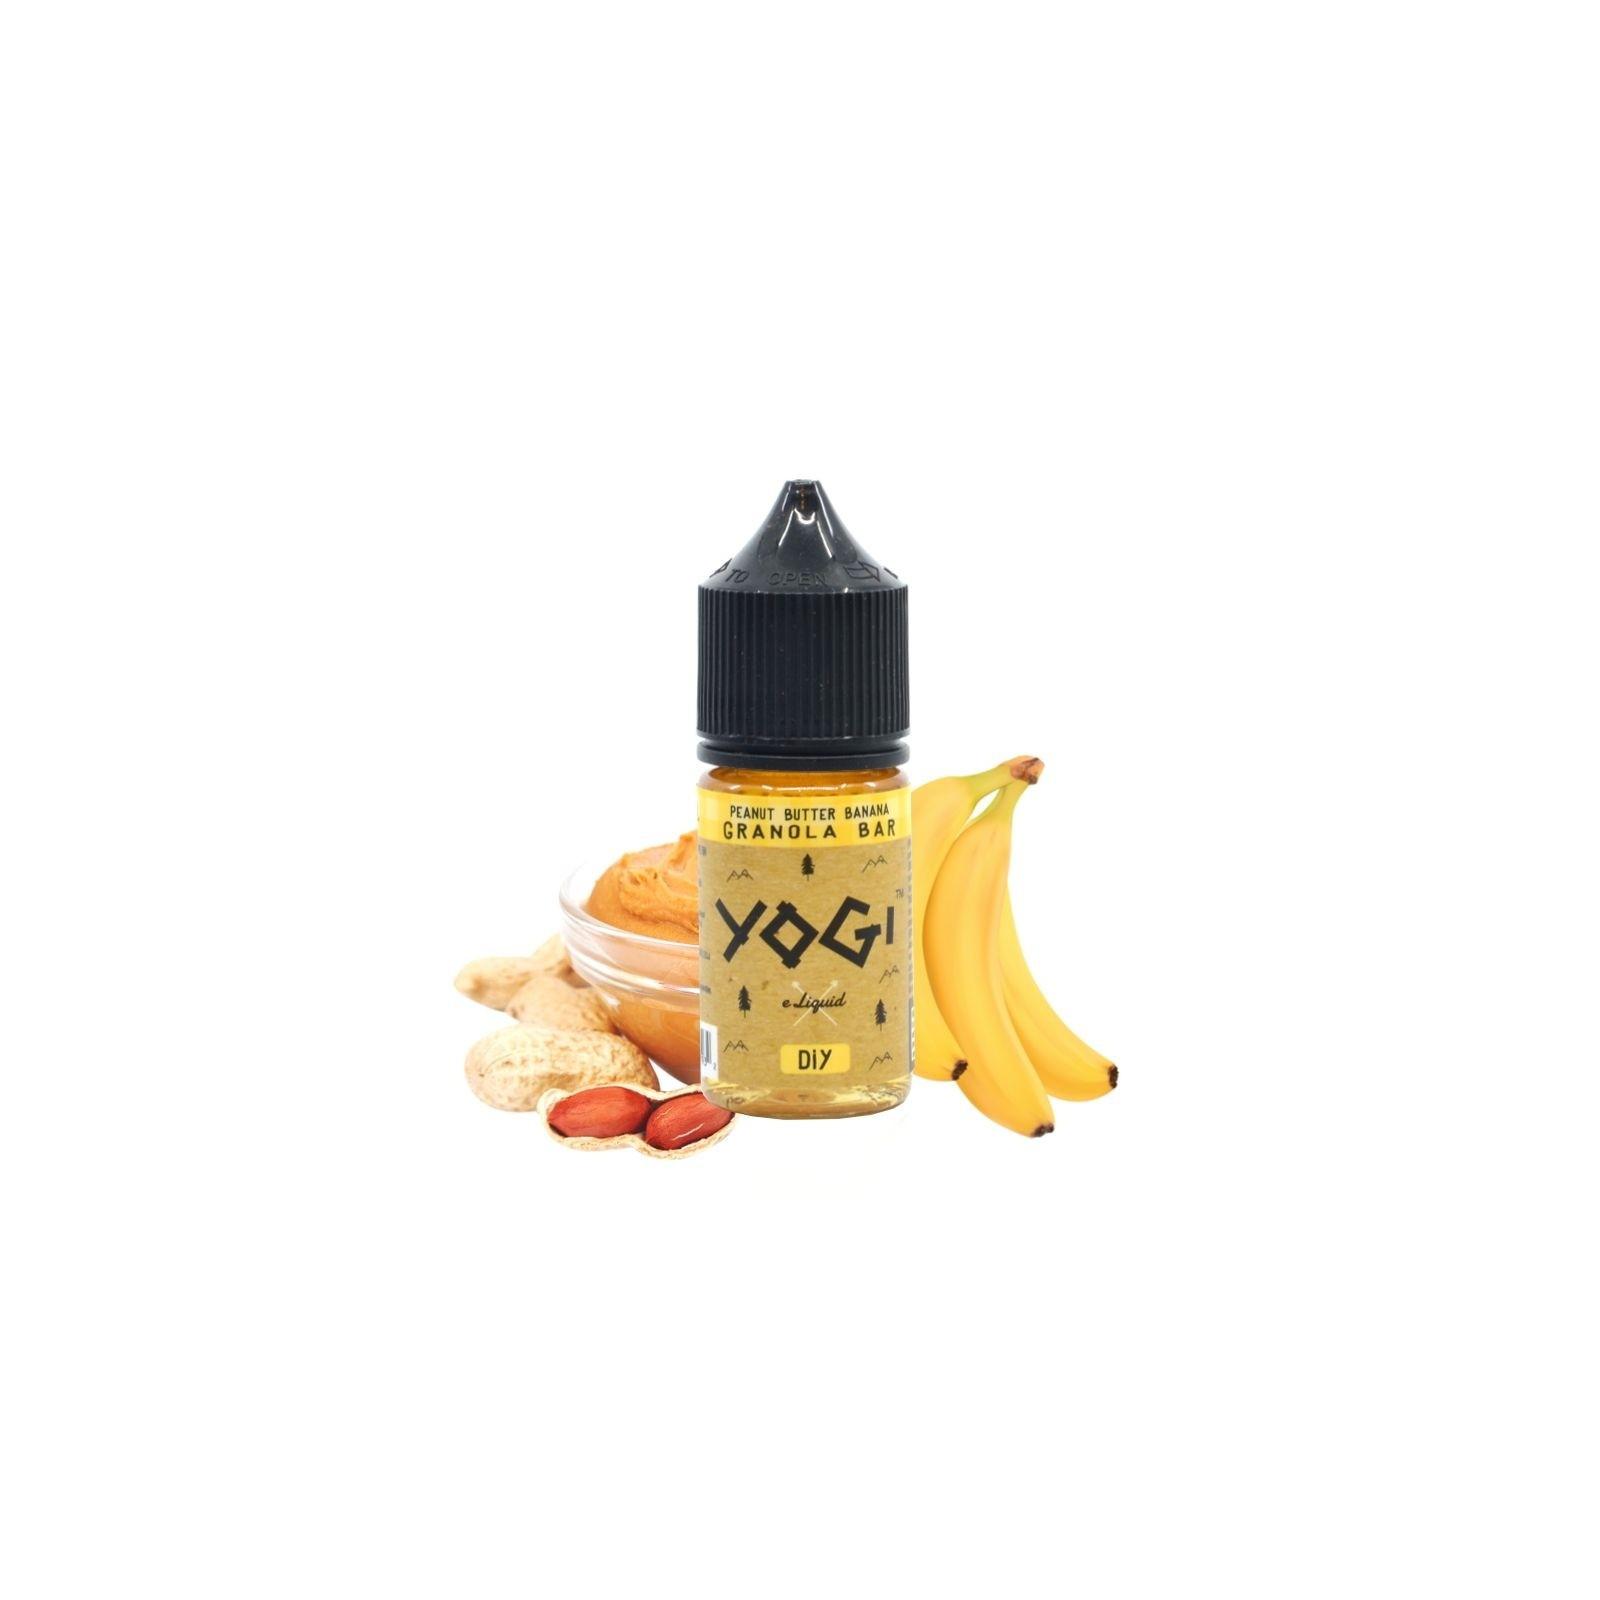 Concentré Peanut Butter Banana Granola Bar - Yogi